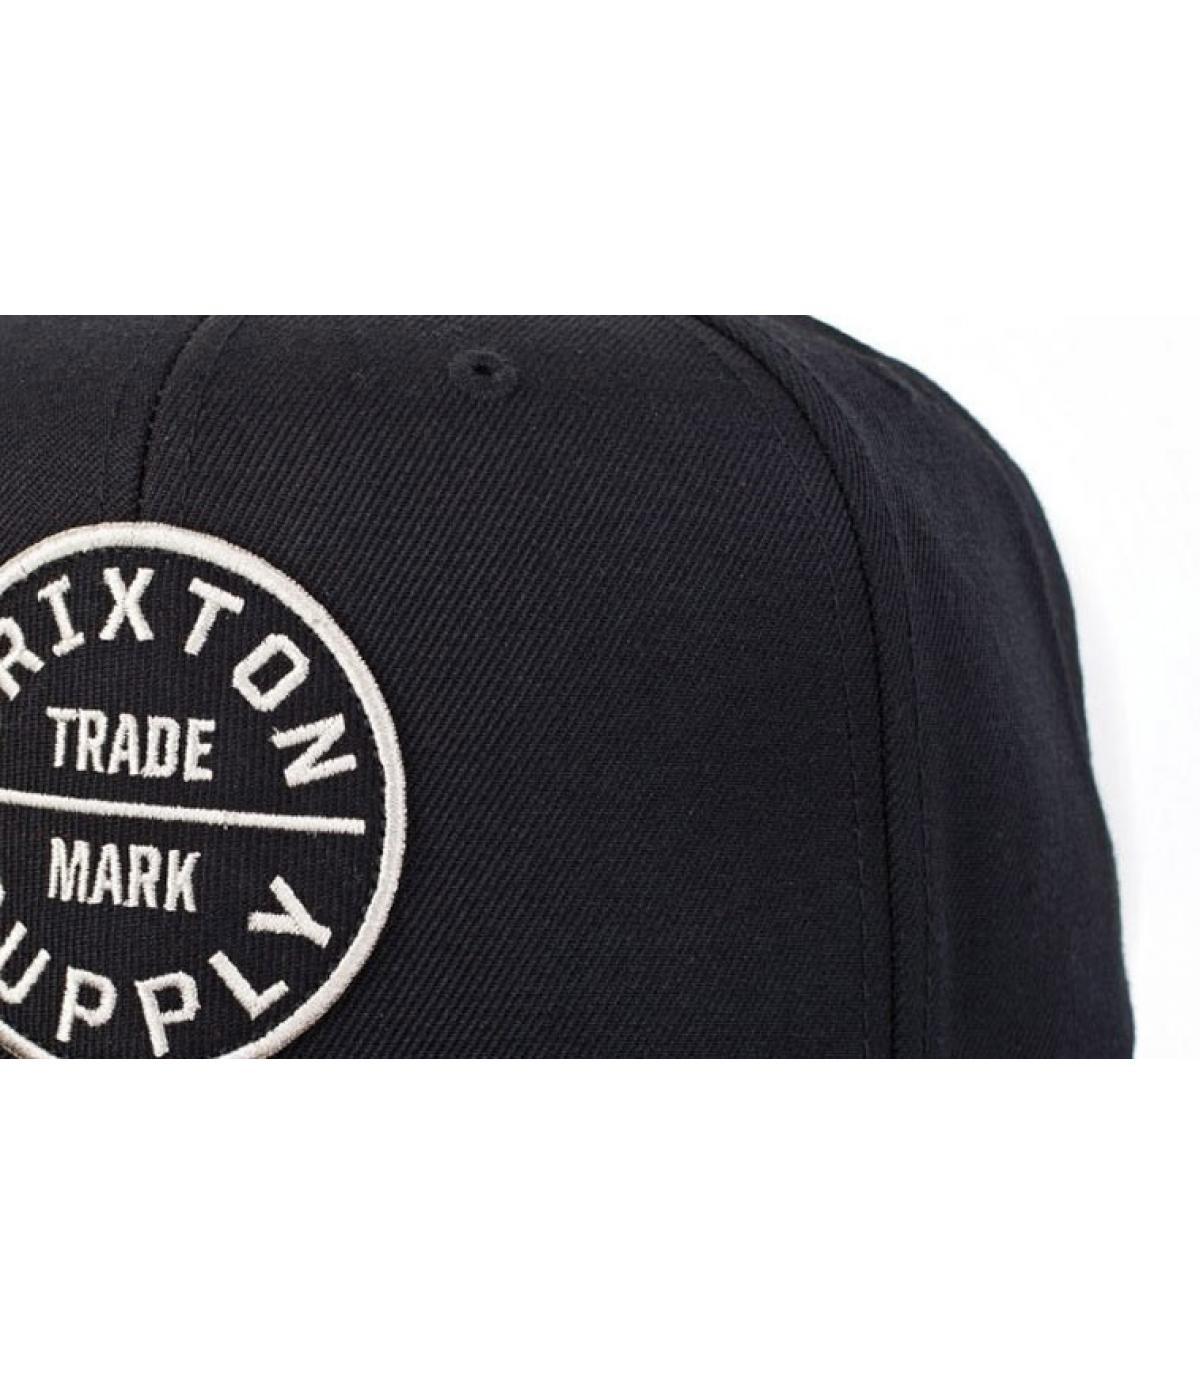 Trendy brixton cap